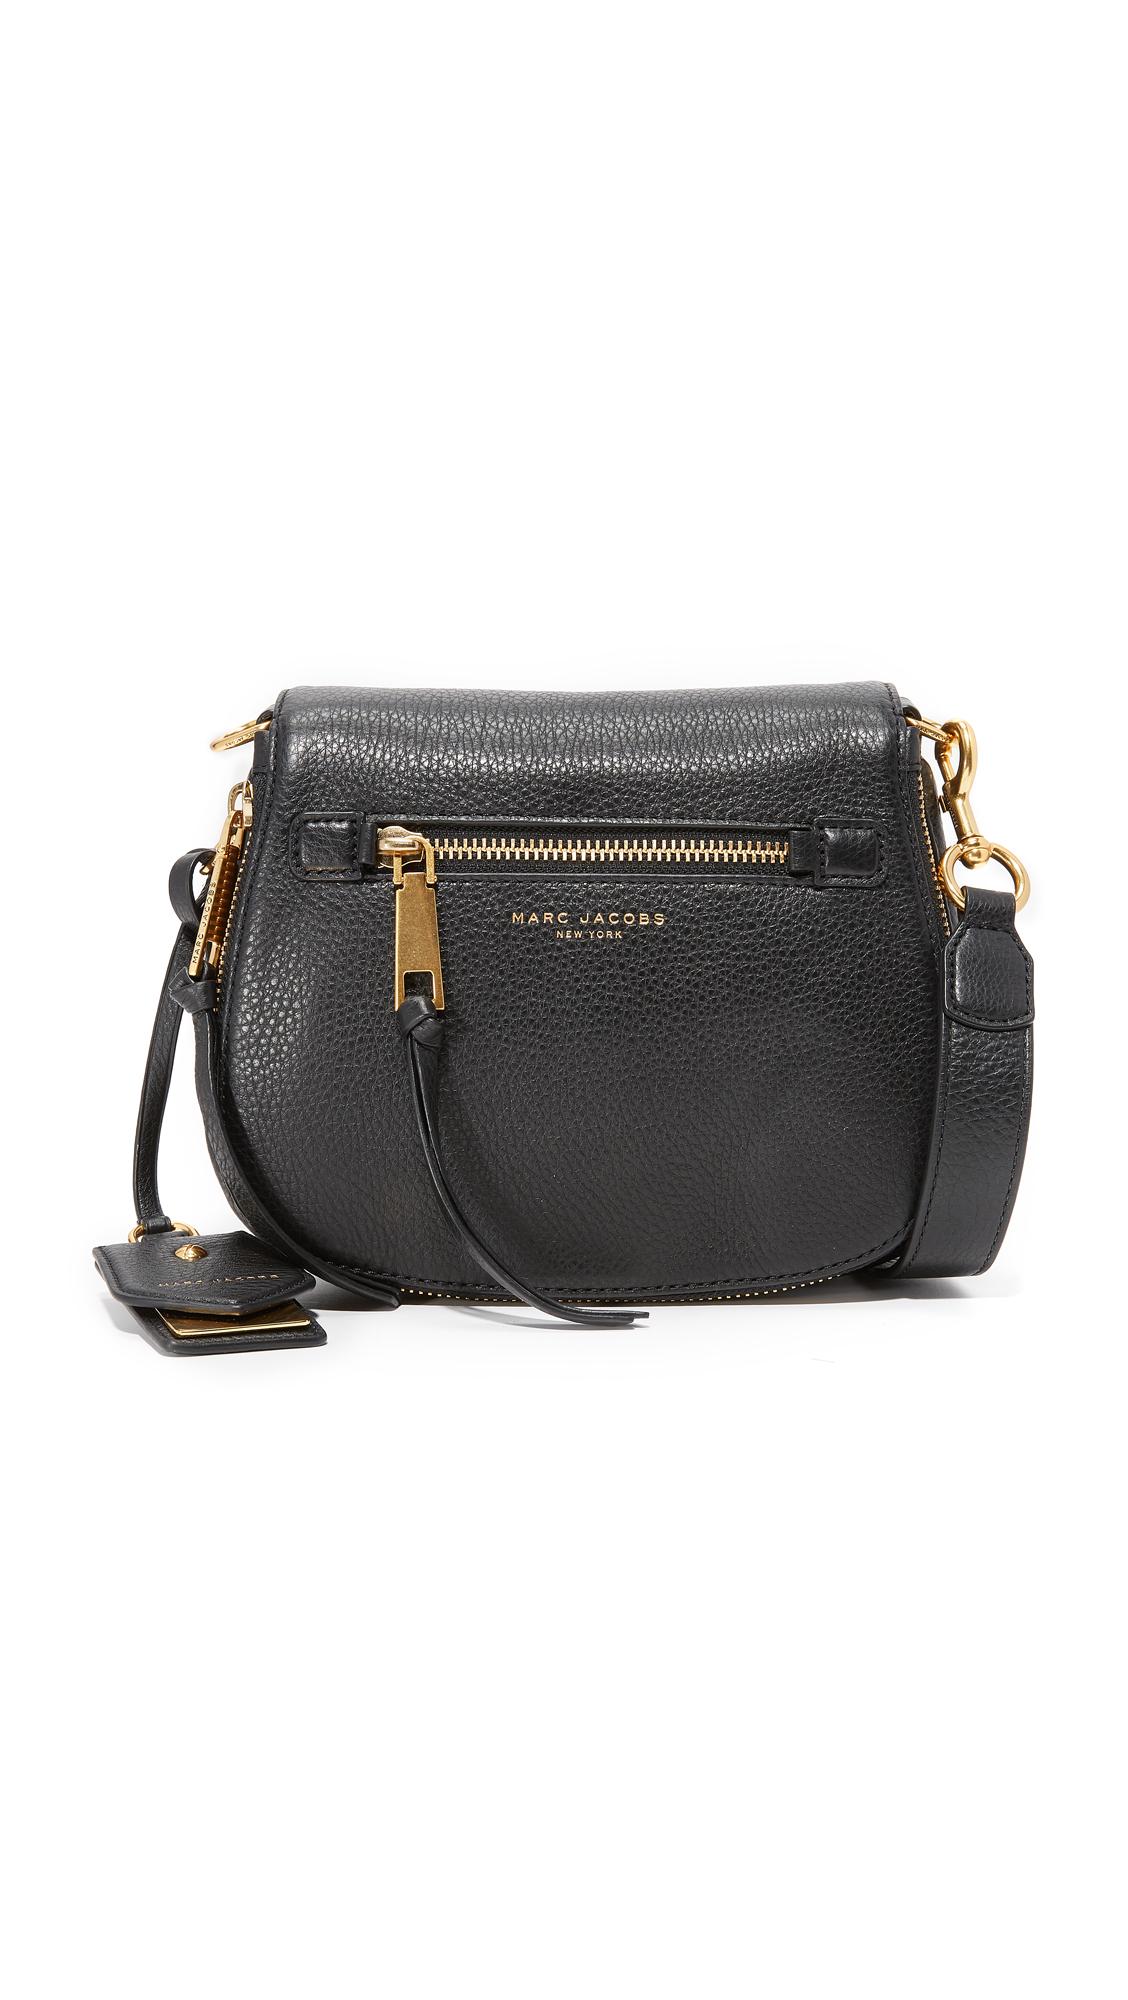 Marc Jacobs Recruit Small Saddle Bag - Black